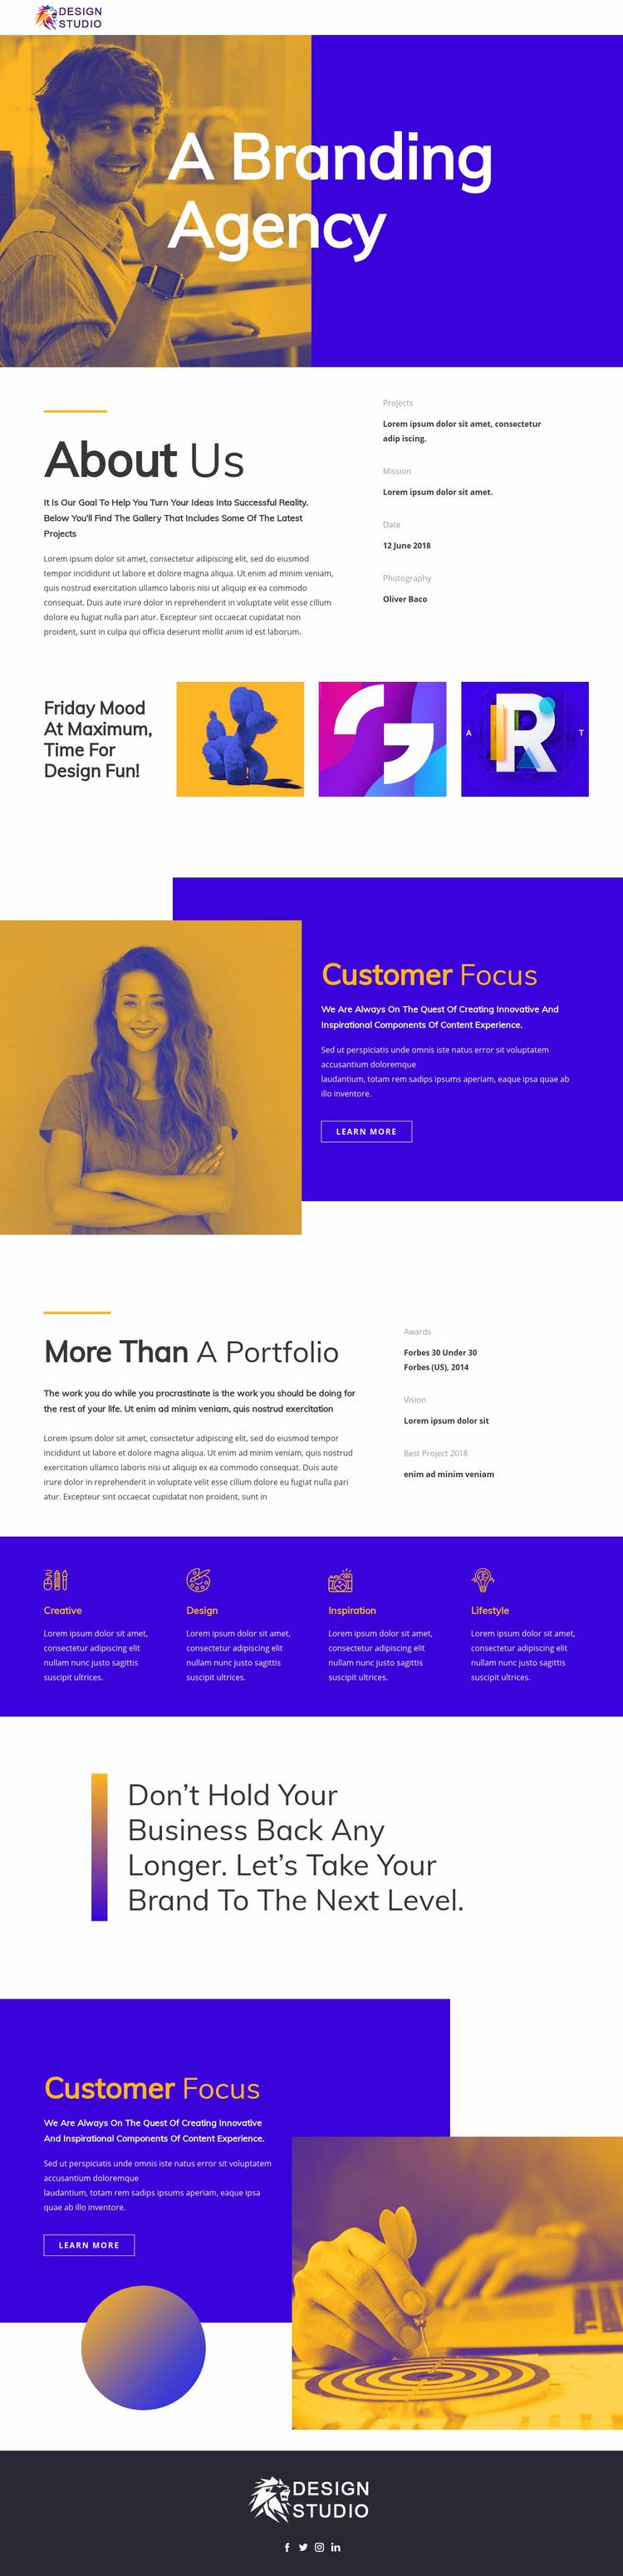 Branding agency for startup Web Page Designer